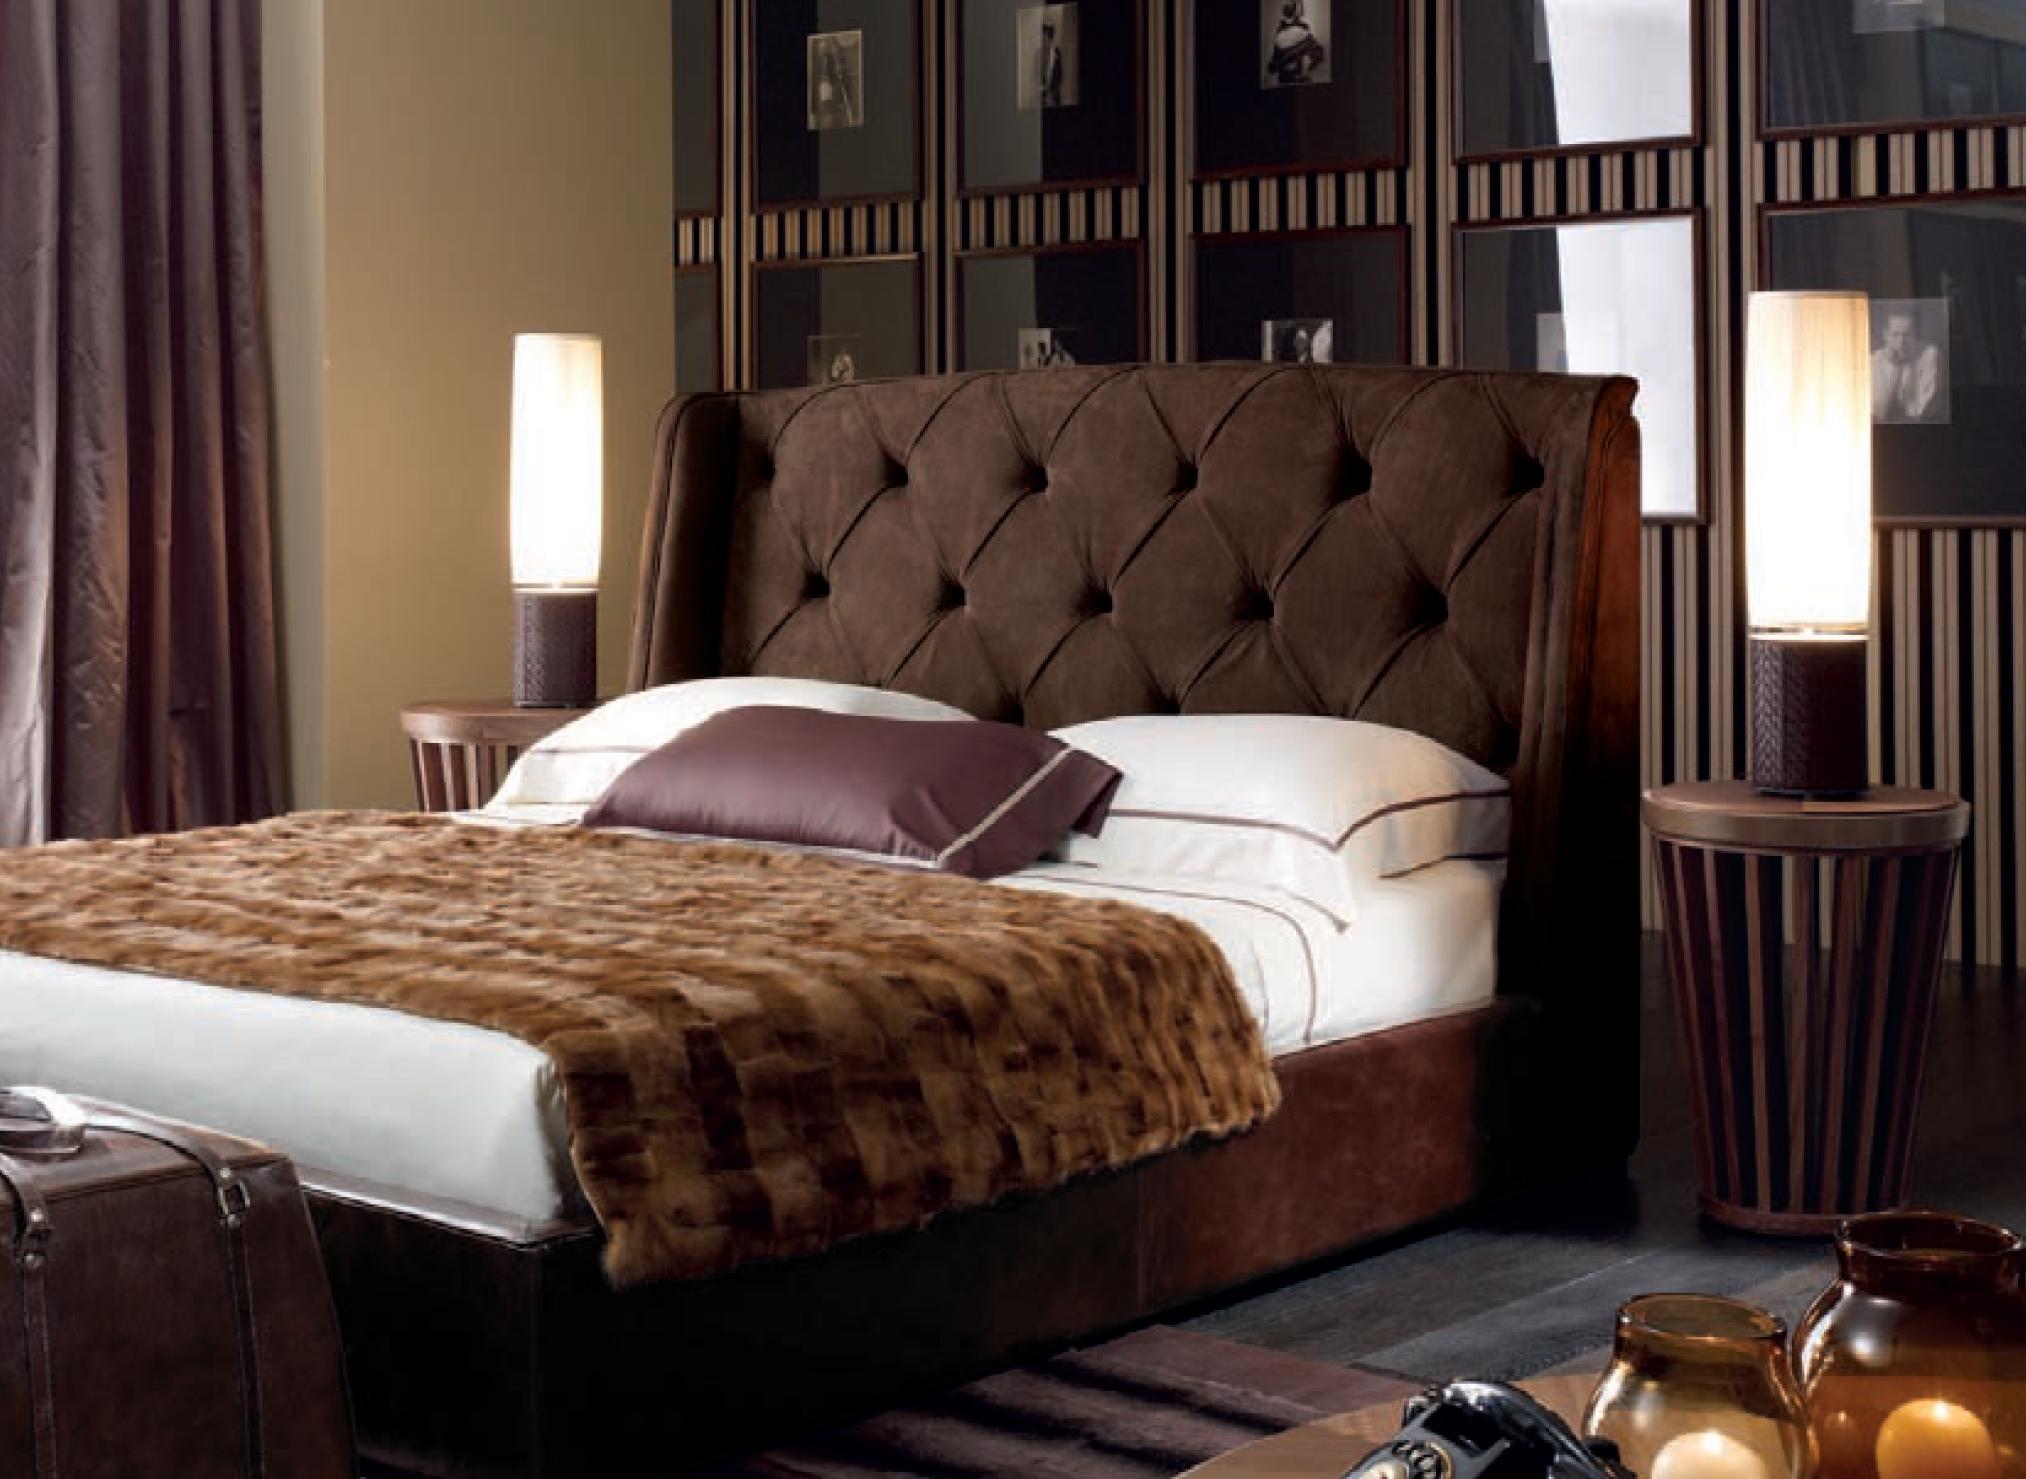 Ulivi Salotti bedroom furniture - An Ode to Leathers @ Masha Shapiro Agency.jpg